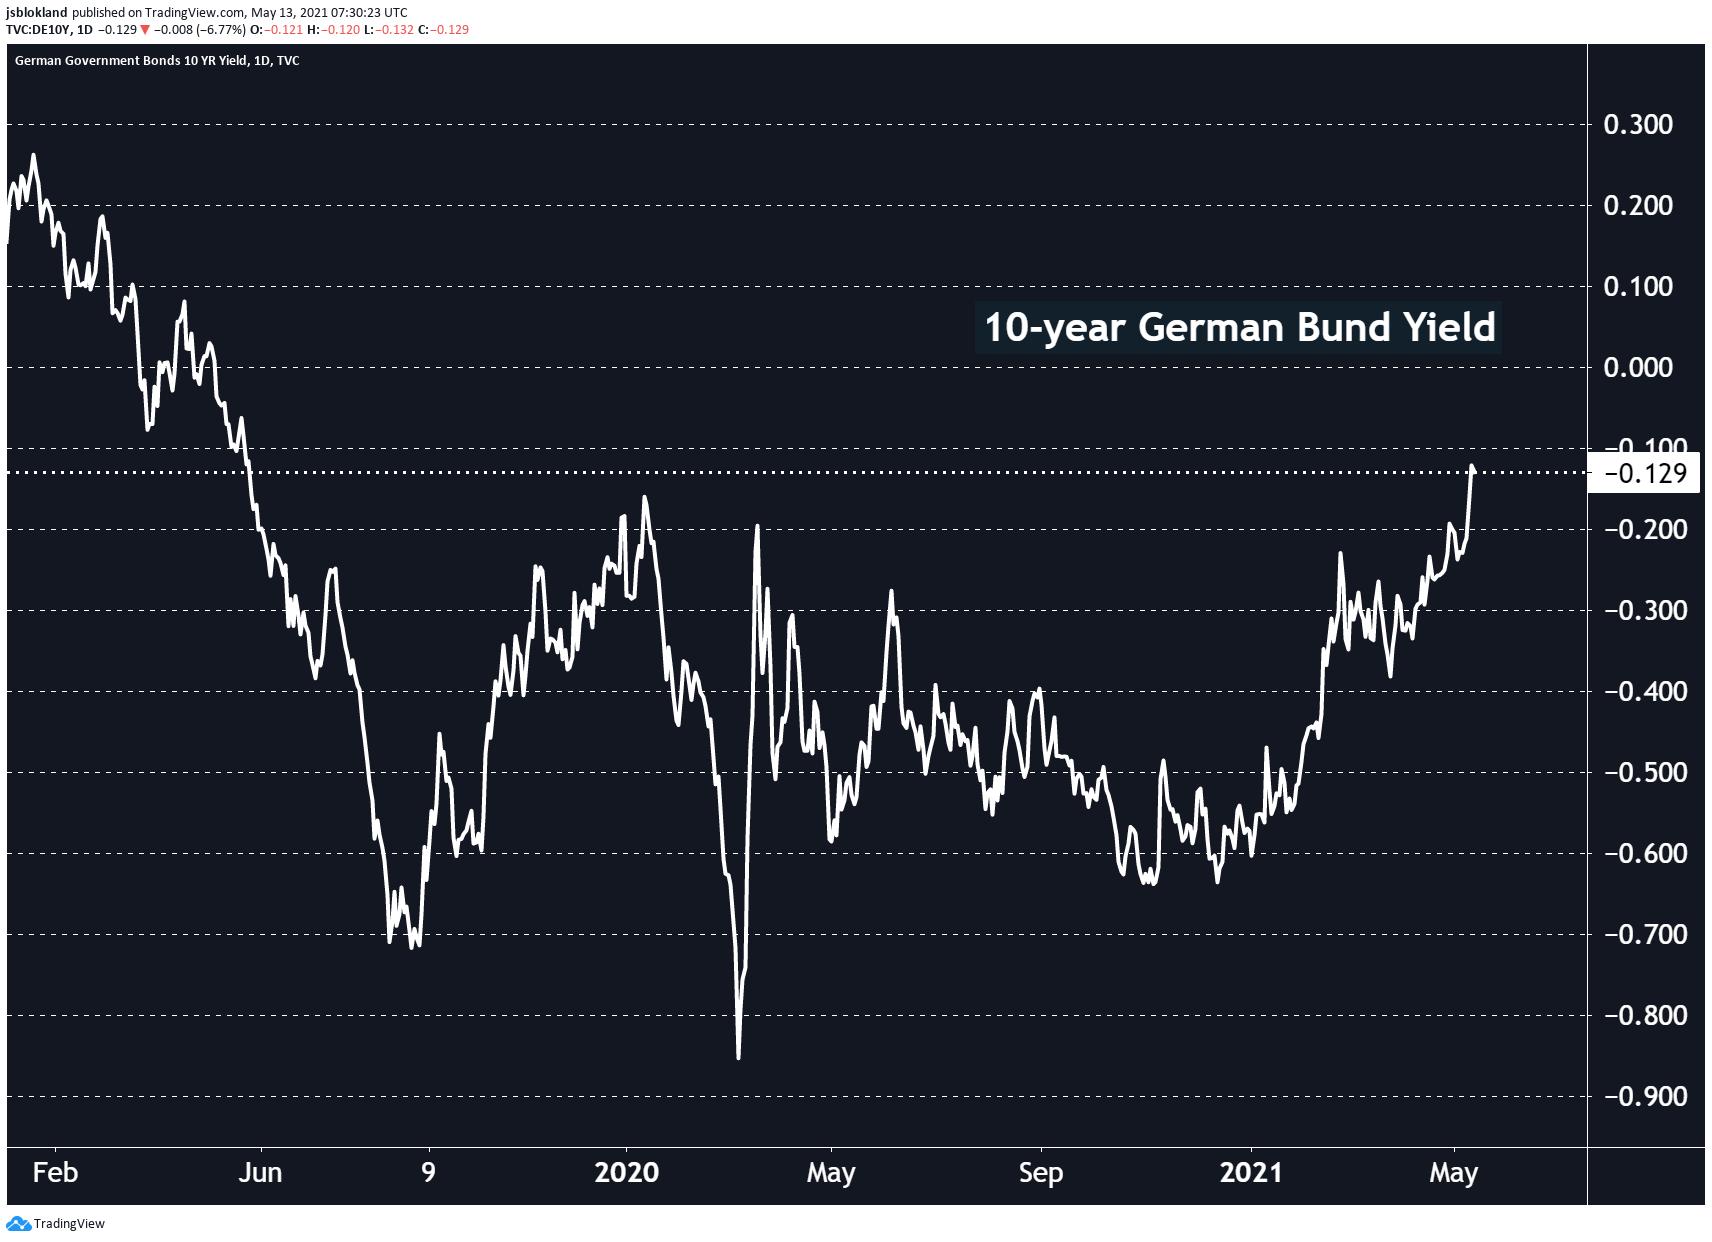 German bund yield reaches 11-month high, nearing positive territory